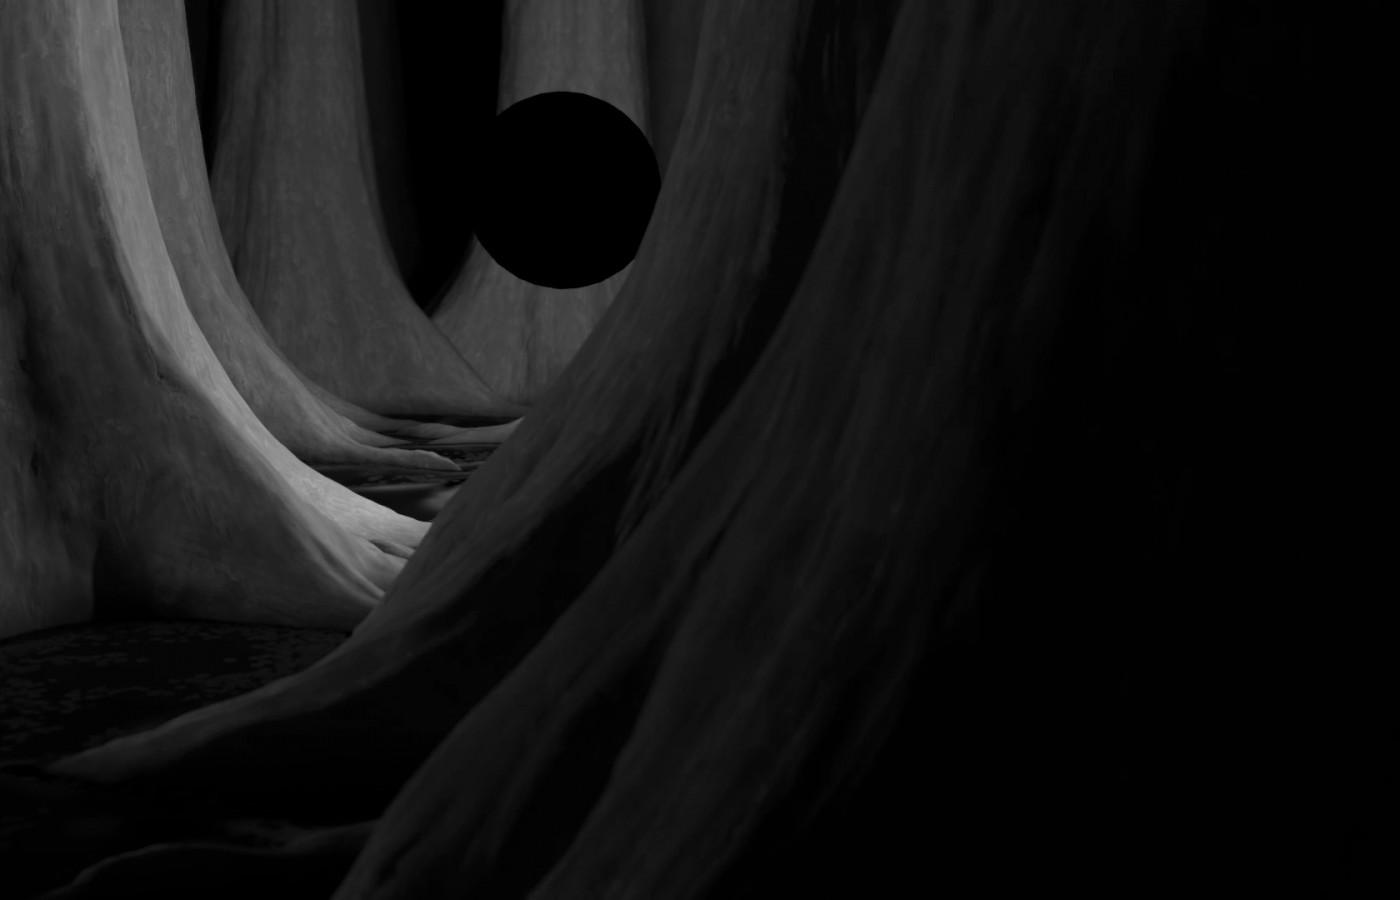 img-Lost_Moon-300dpi-3